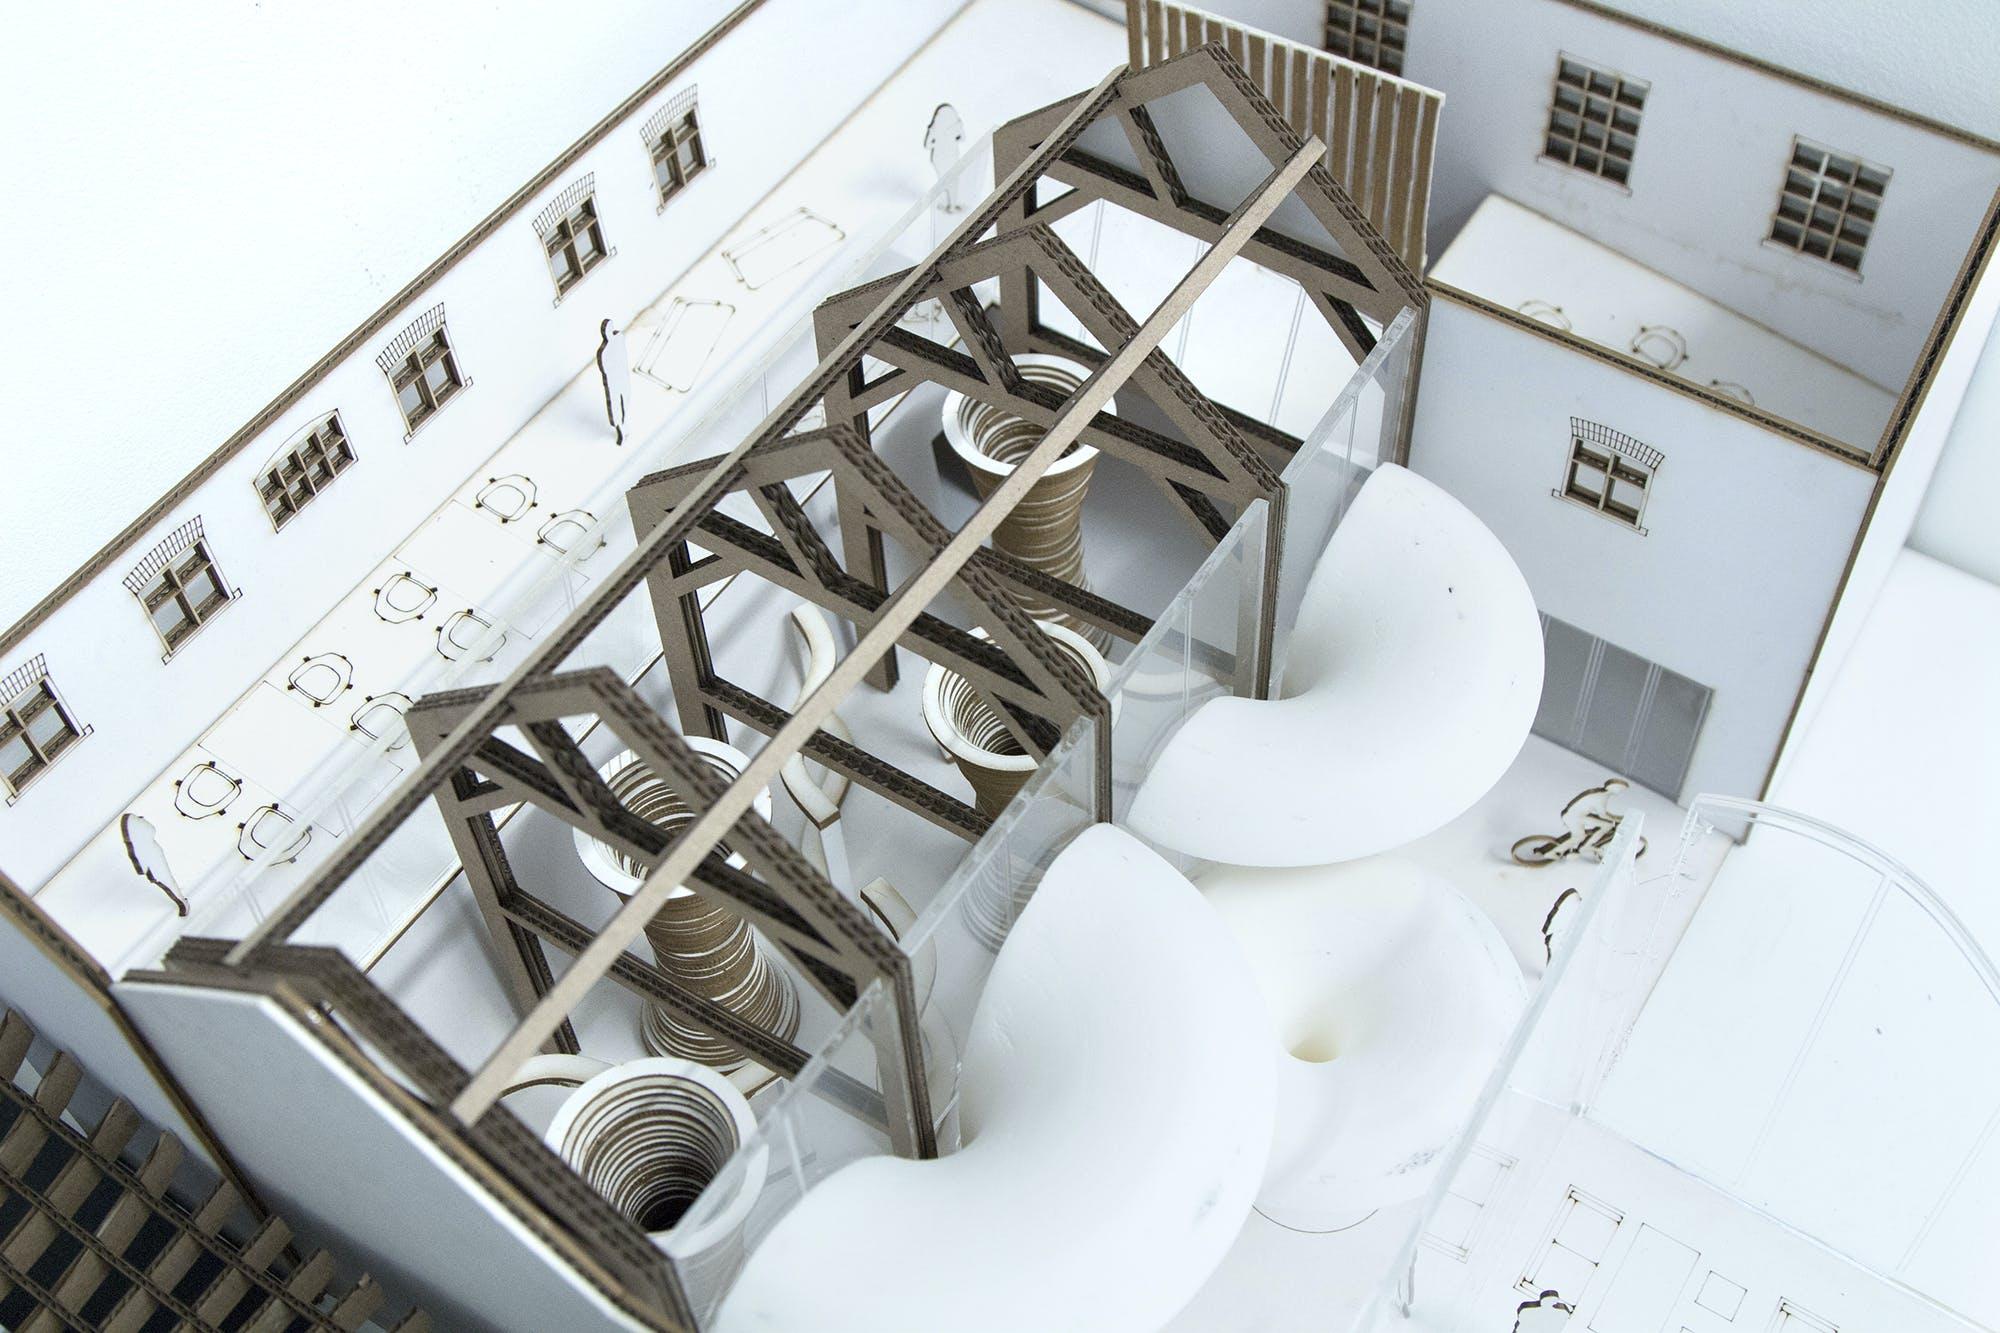 ... Interior Architecture And Design Student Work 4 ... Photo